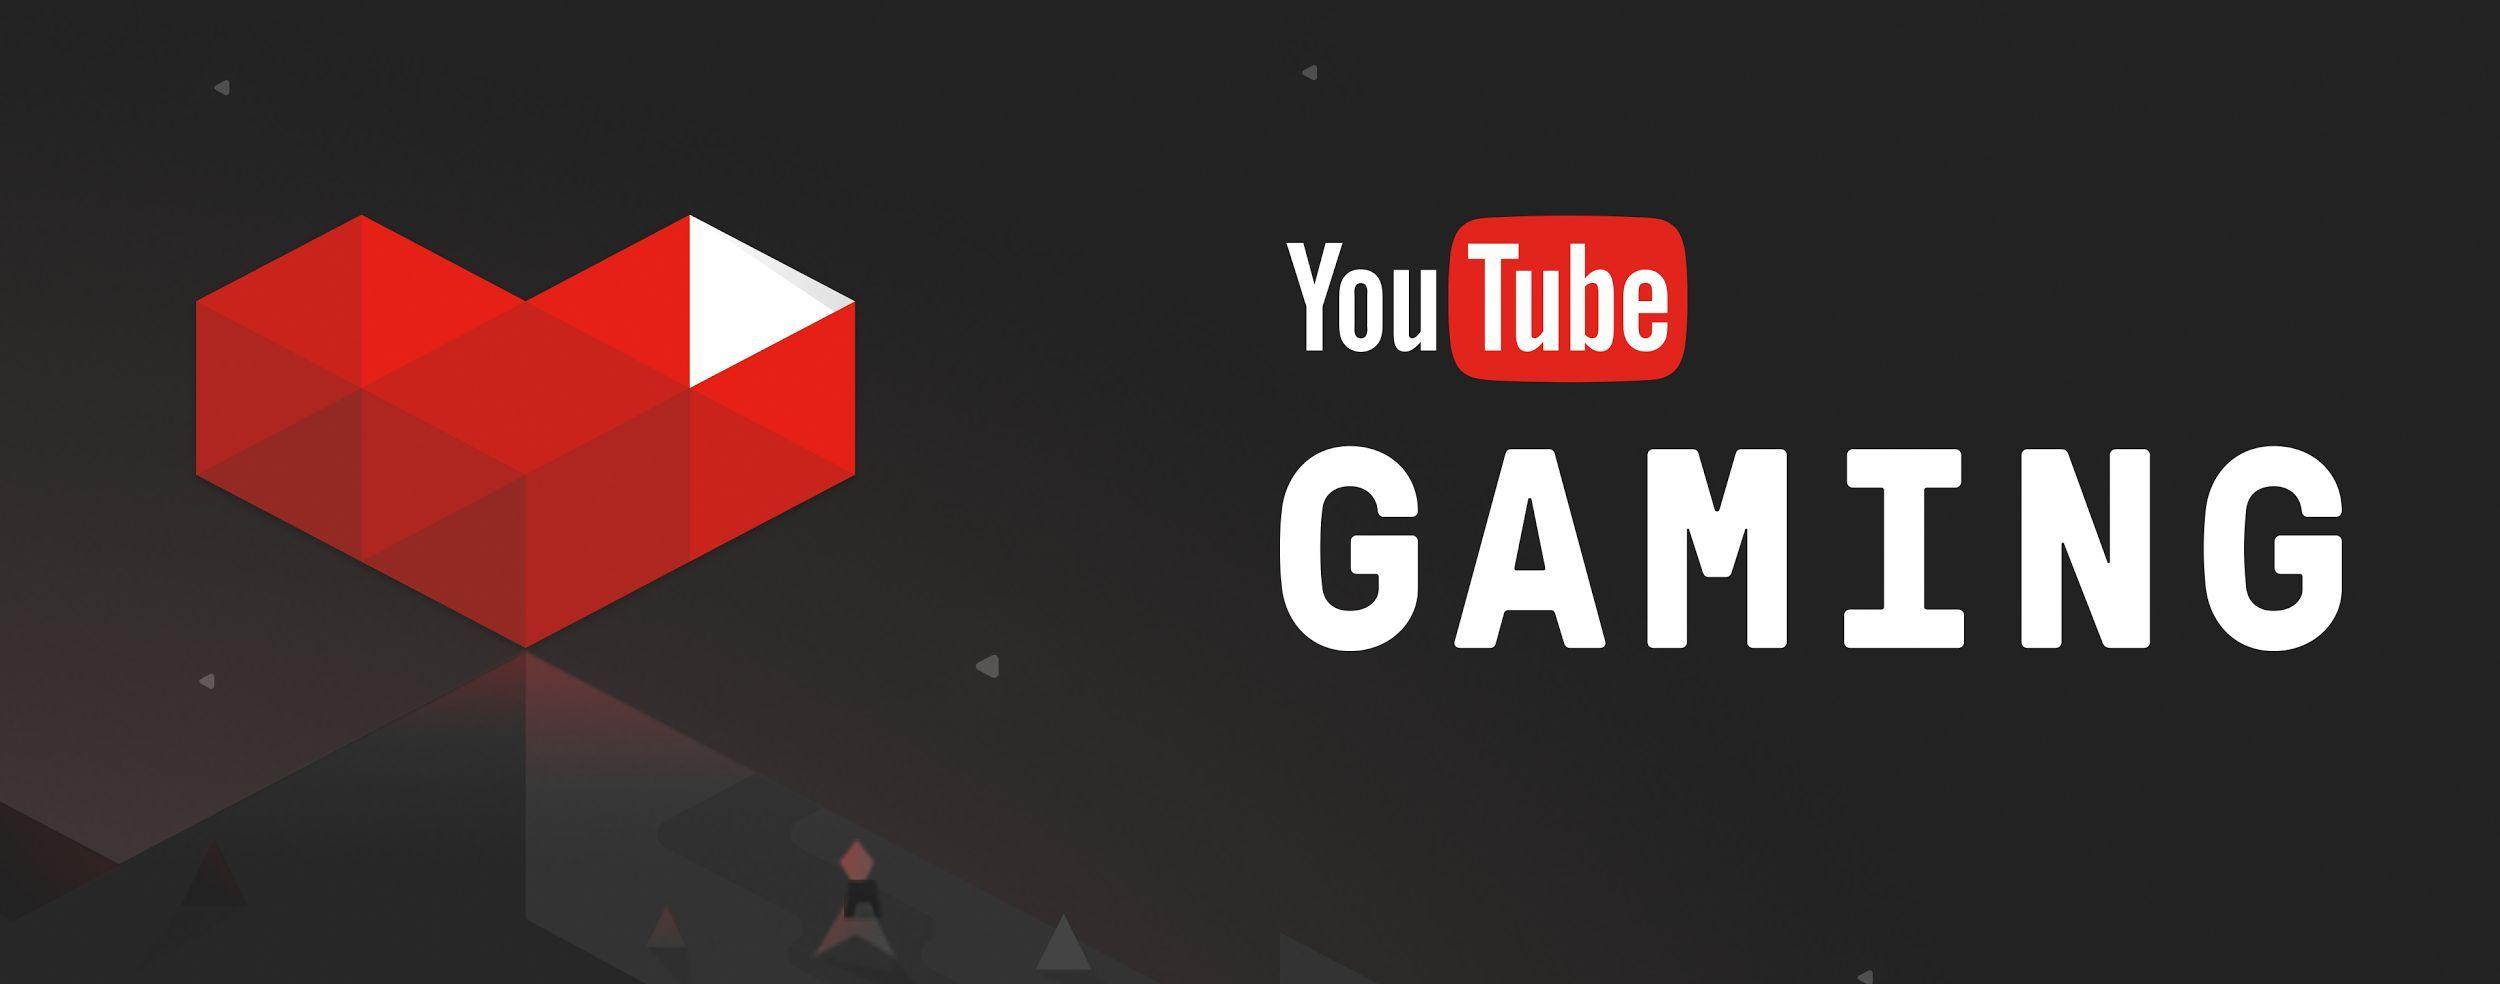 youtube gaming - HD1969×984